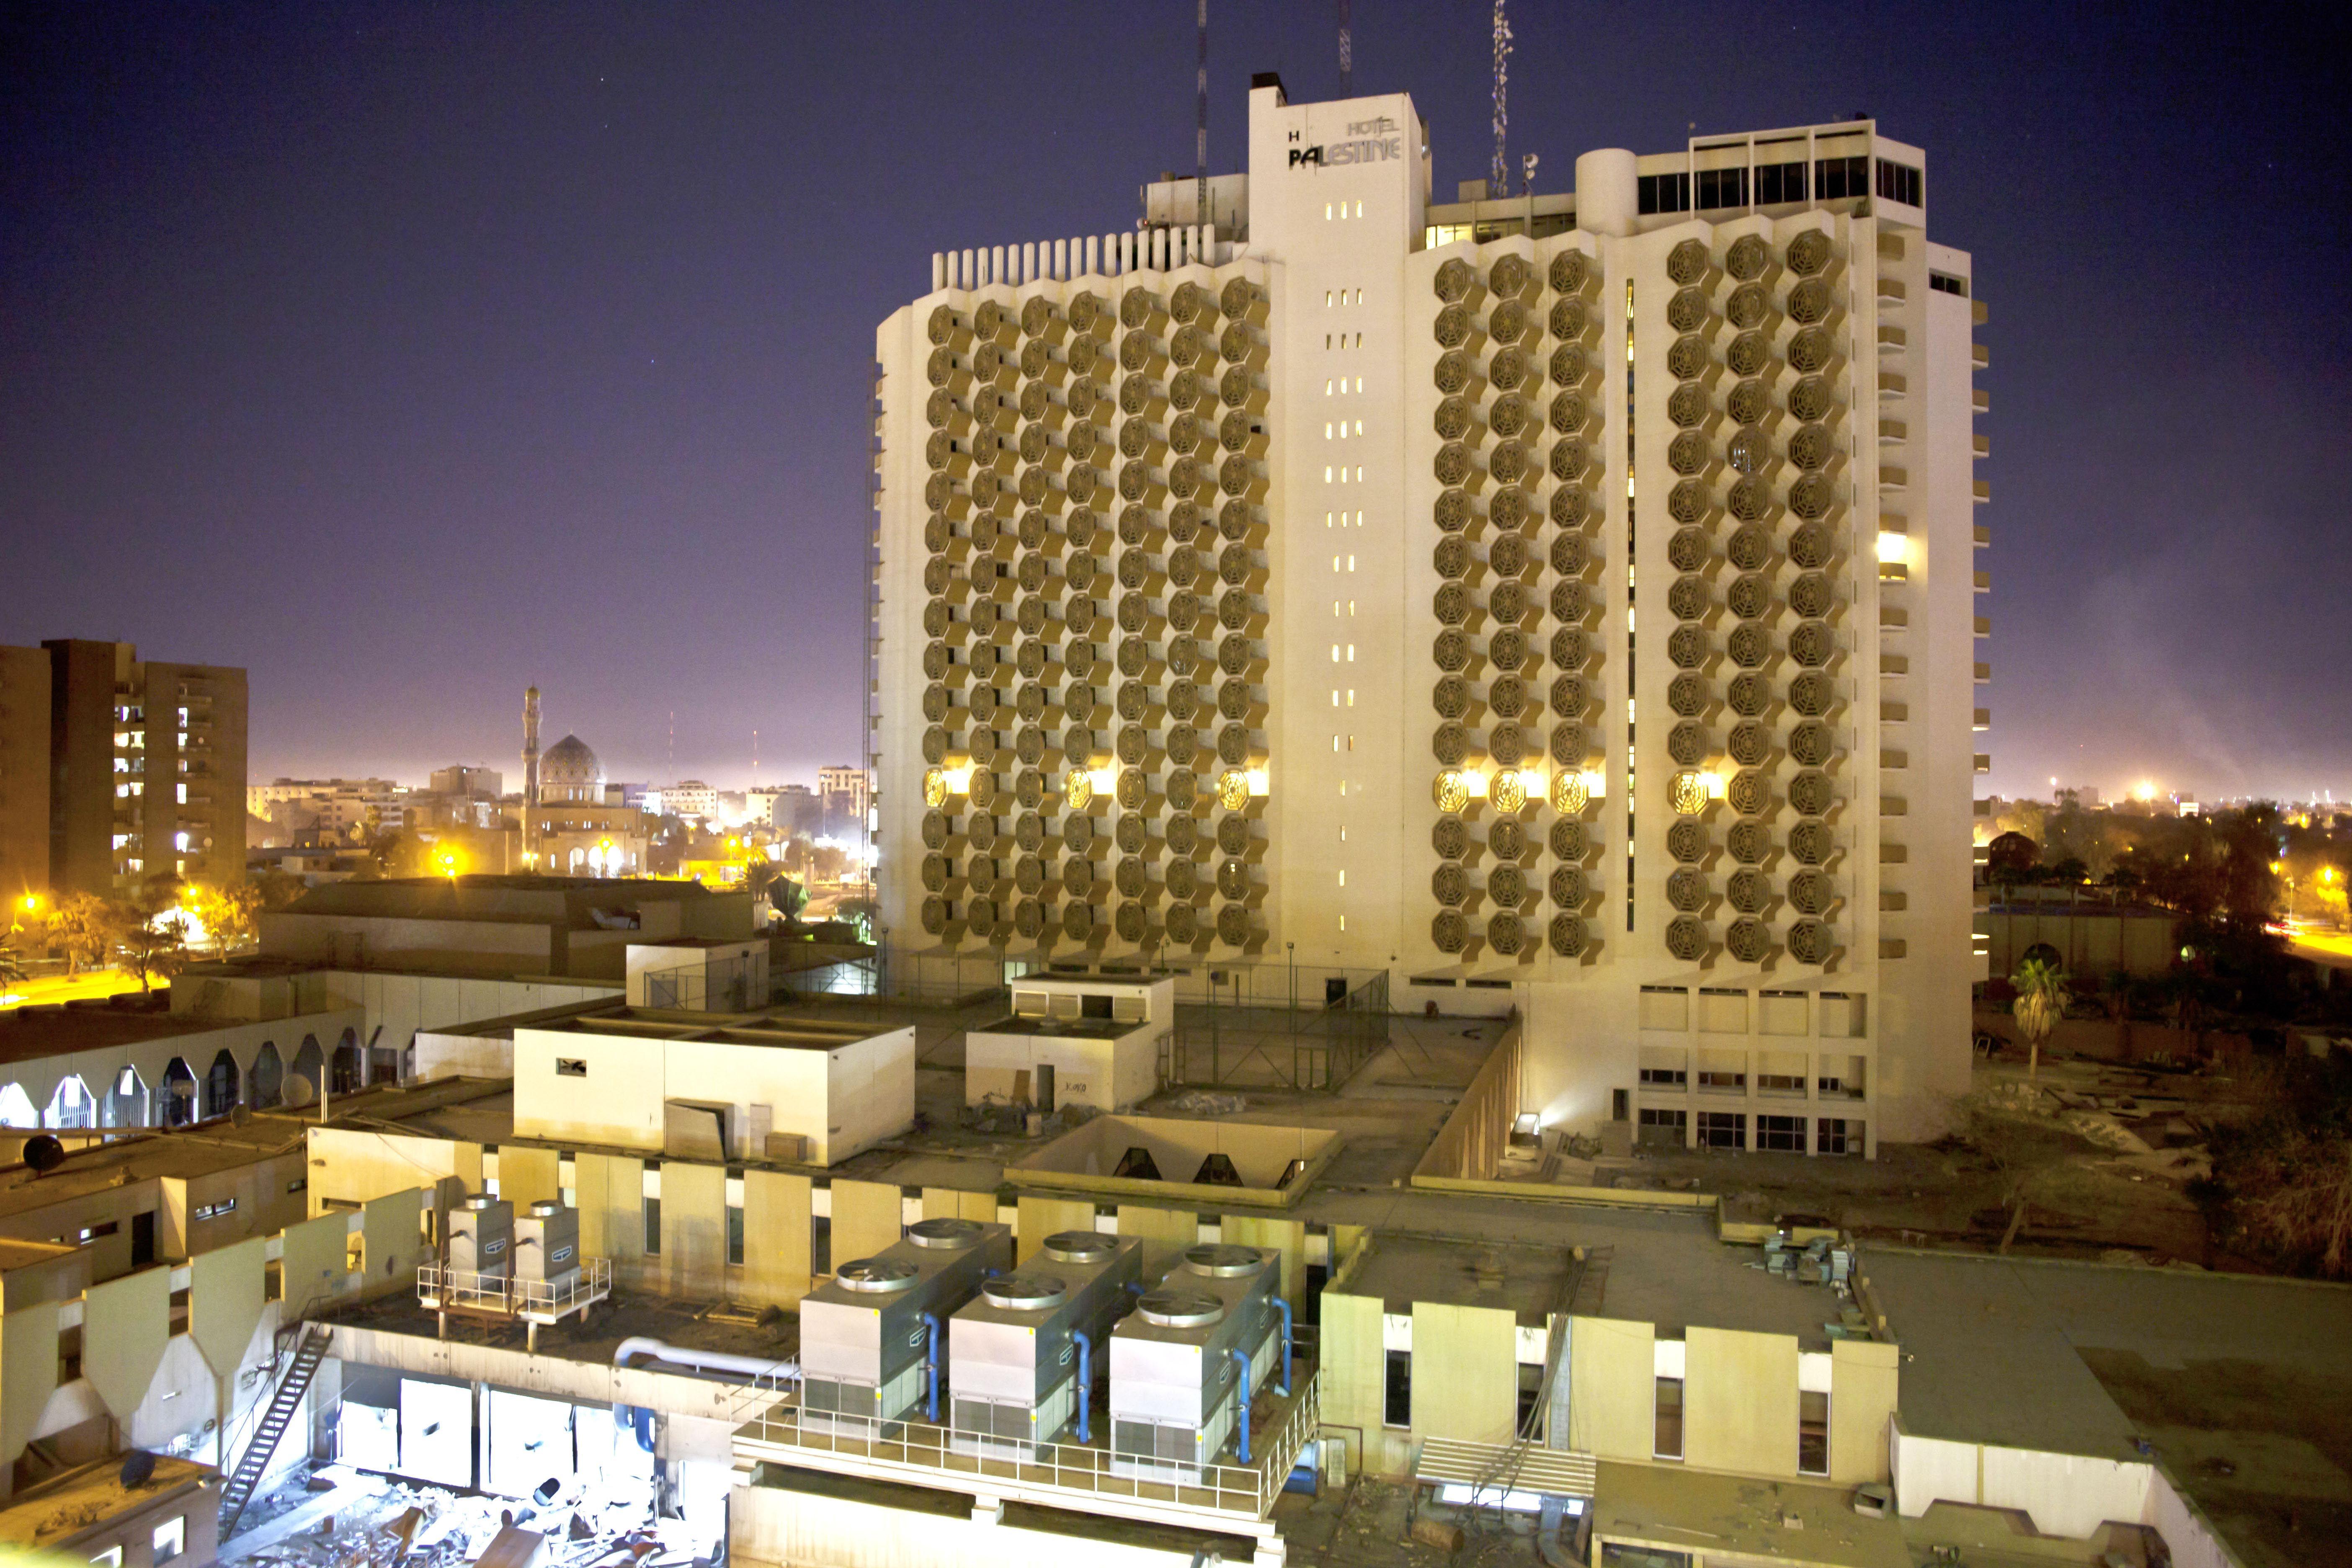 Palestine Hotel Baghdad فندق فلسطين بغداد Architecture Baghdad Iraq Baghdad